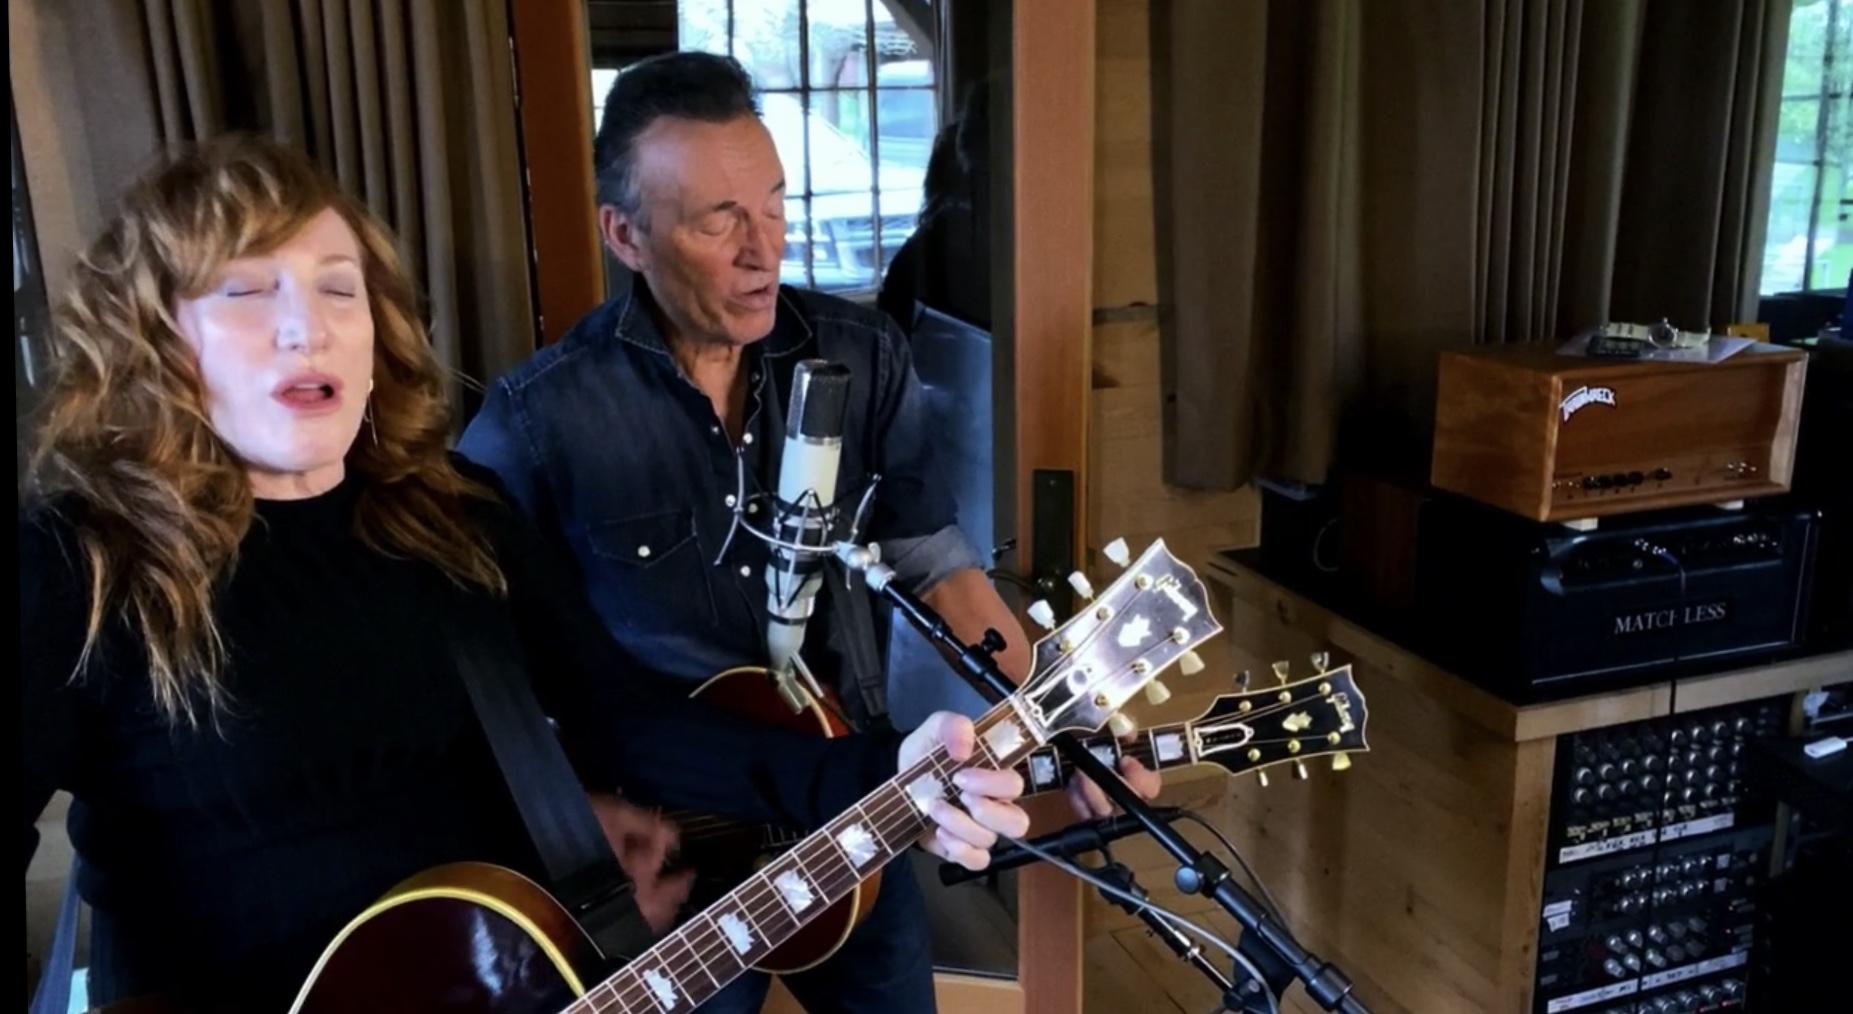 Bruce Springsteen y Patti Scialfa en Jersey4Jersey